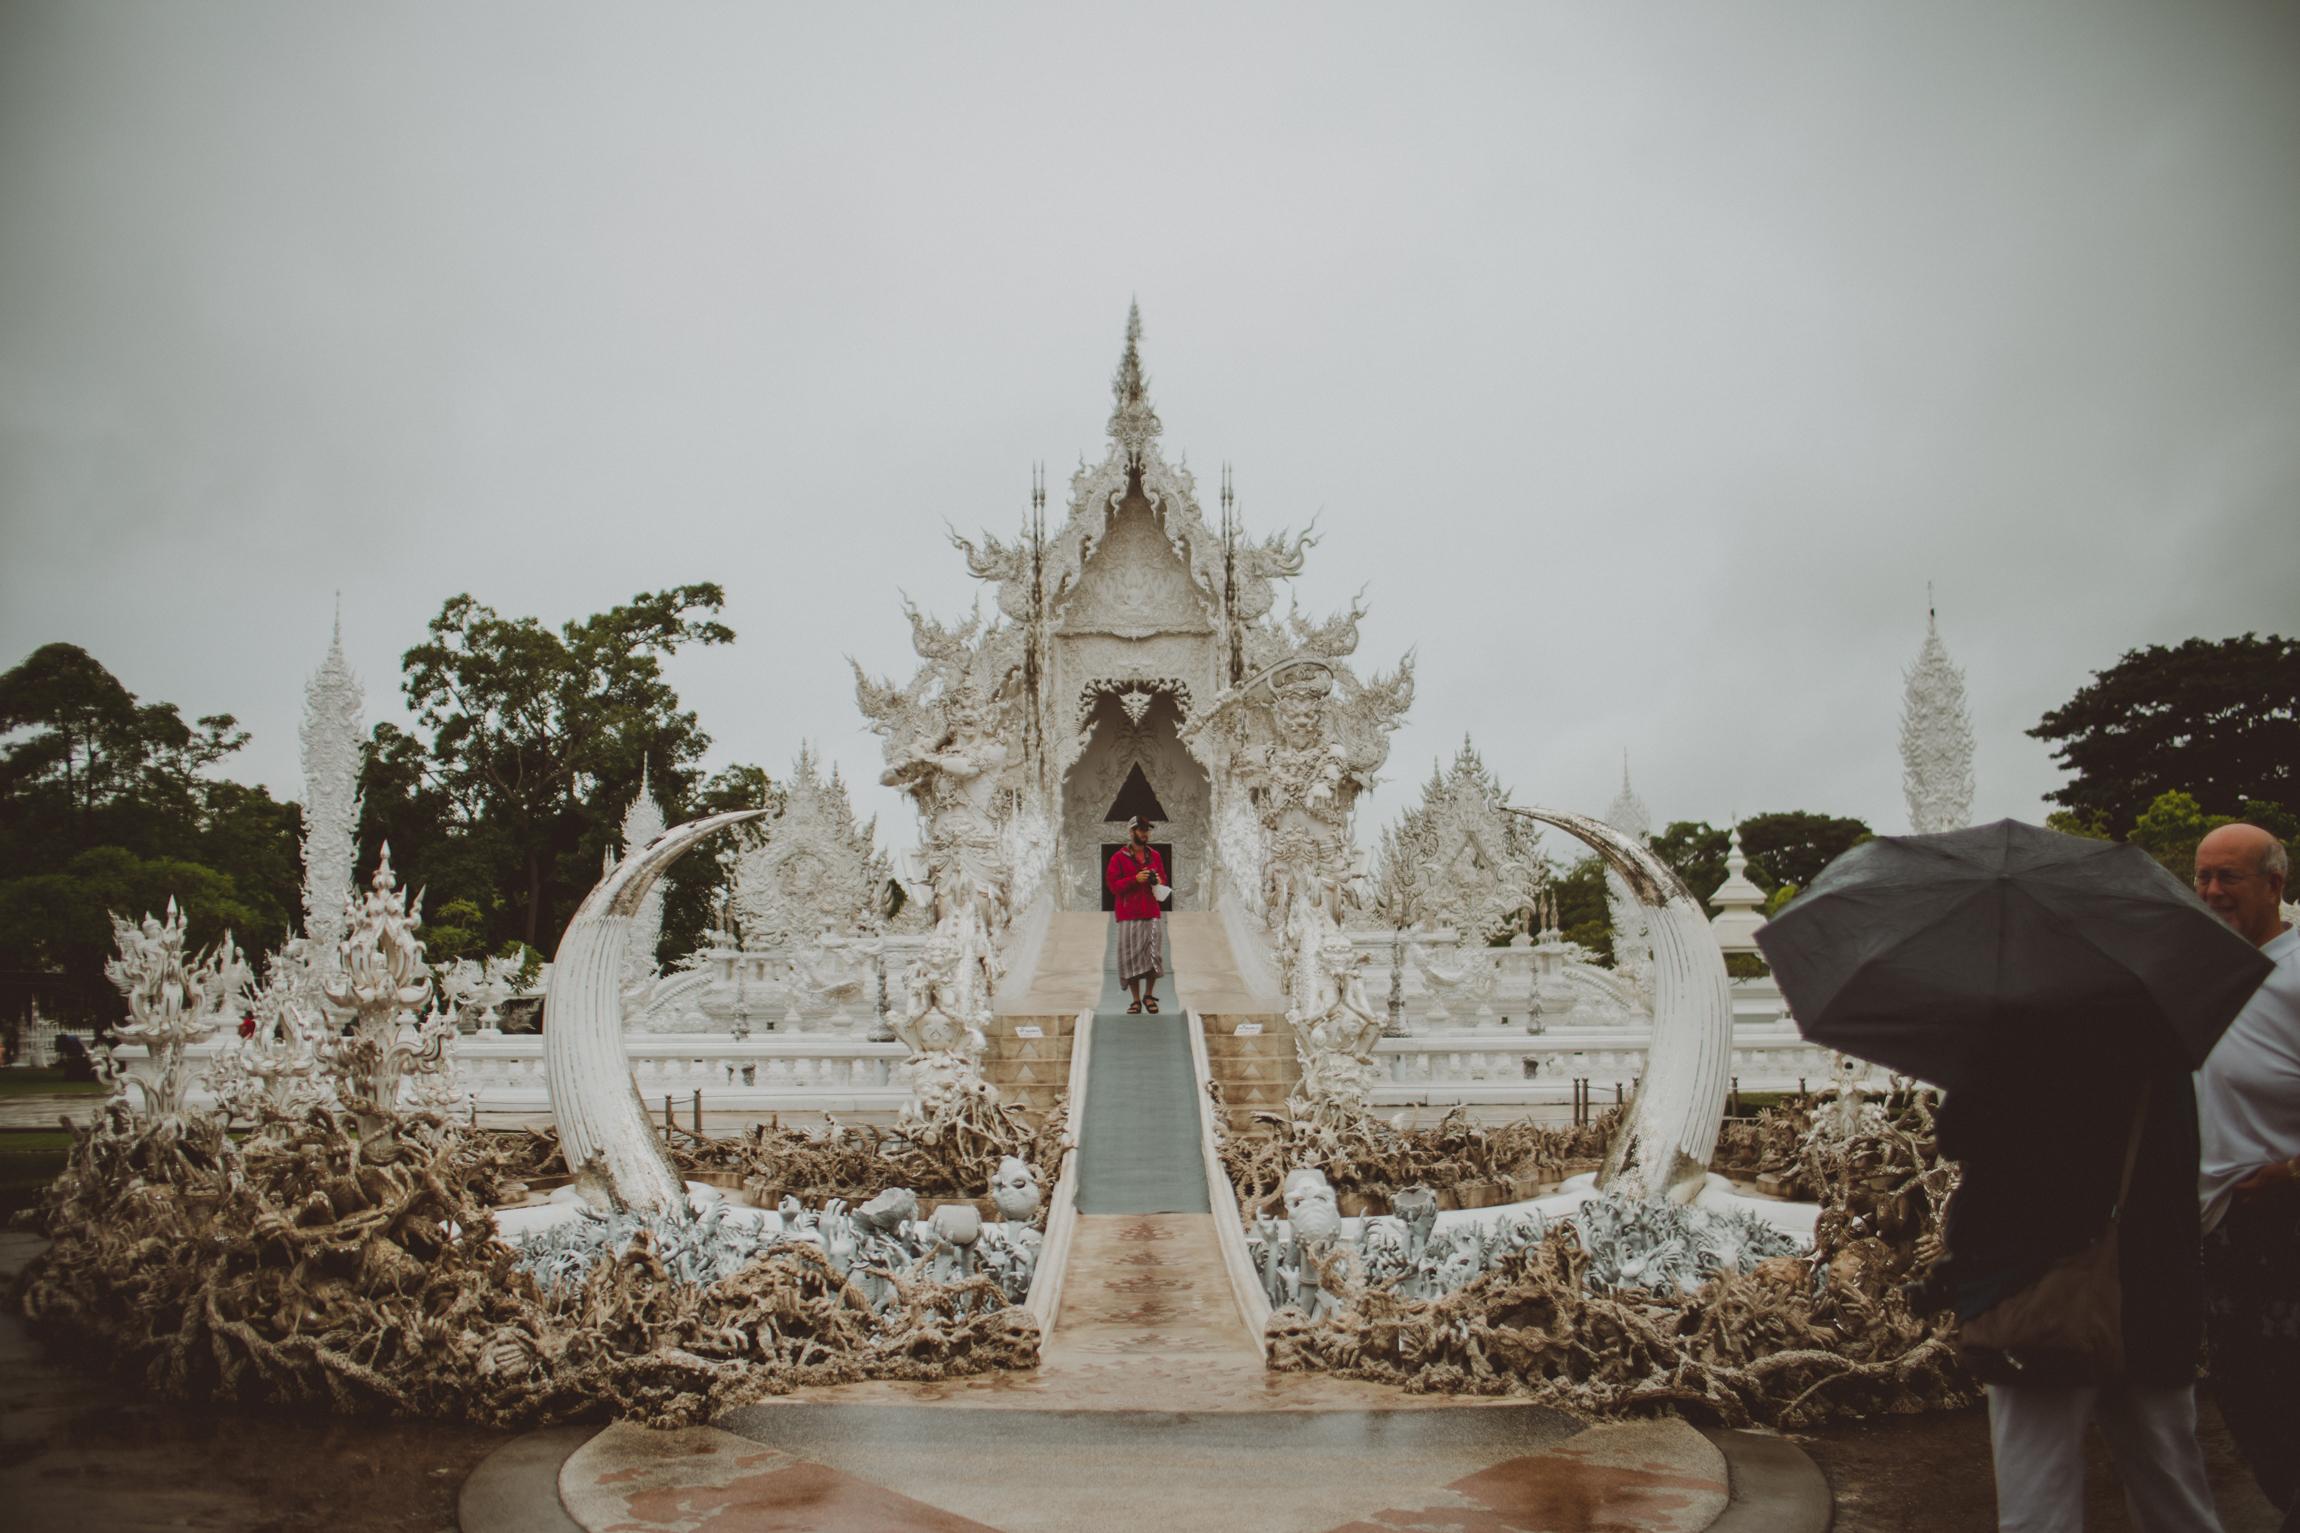 thailand-25-2.jpg